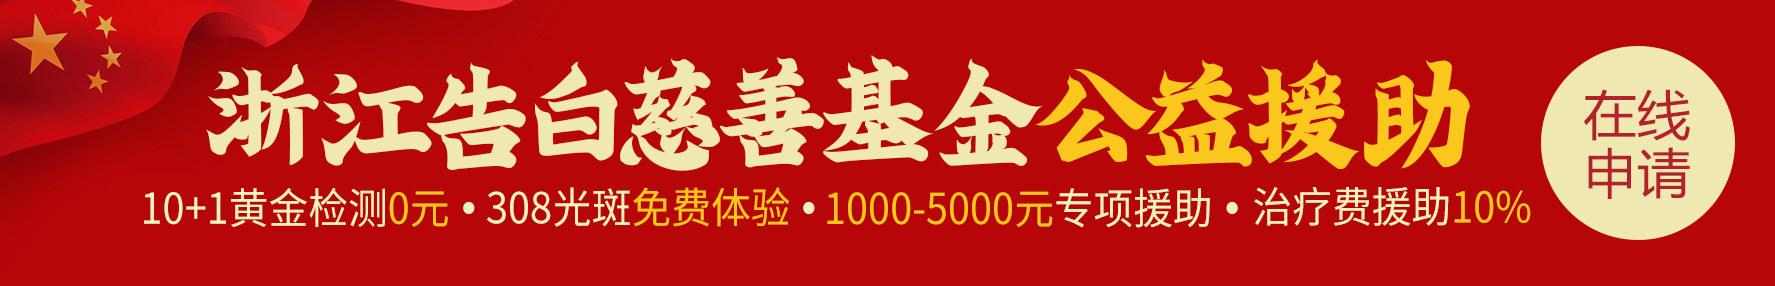 杭州白癜风